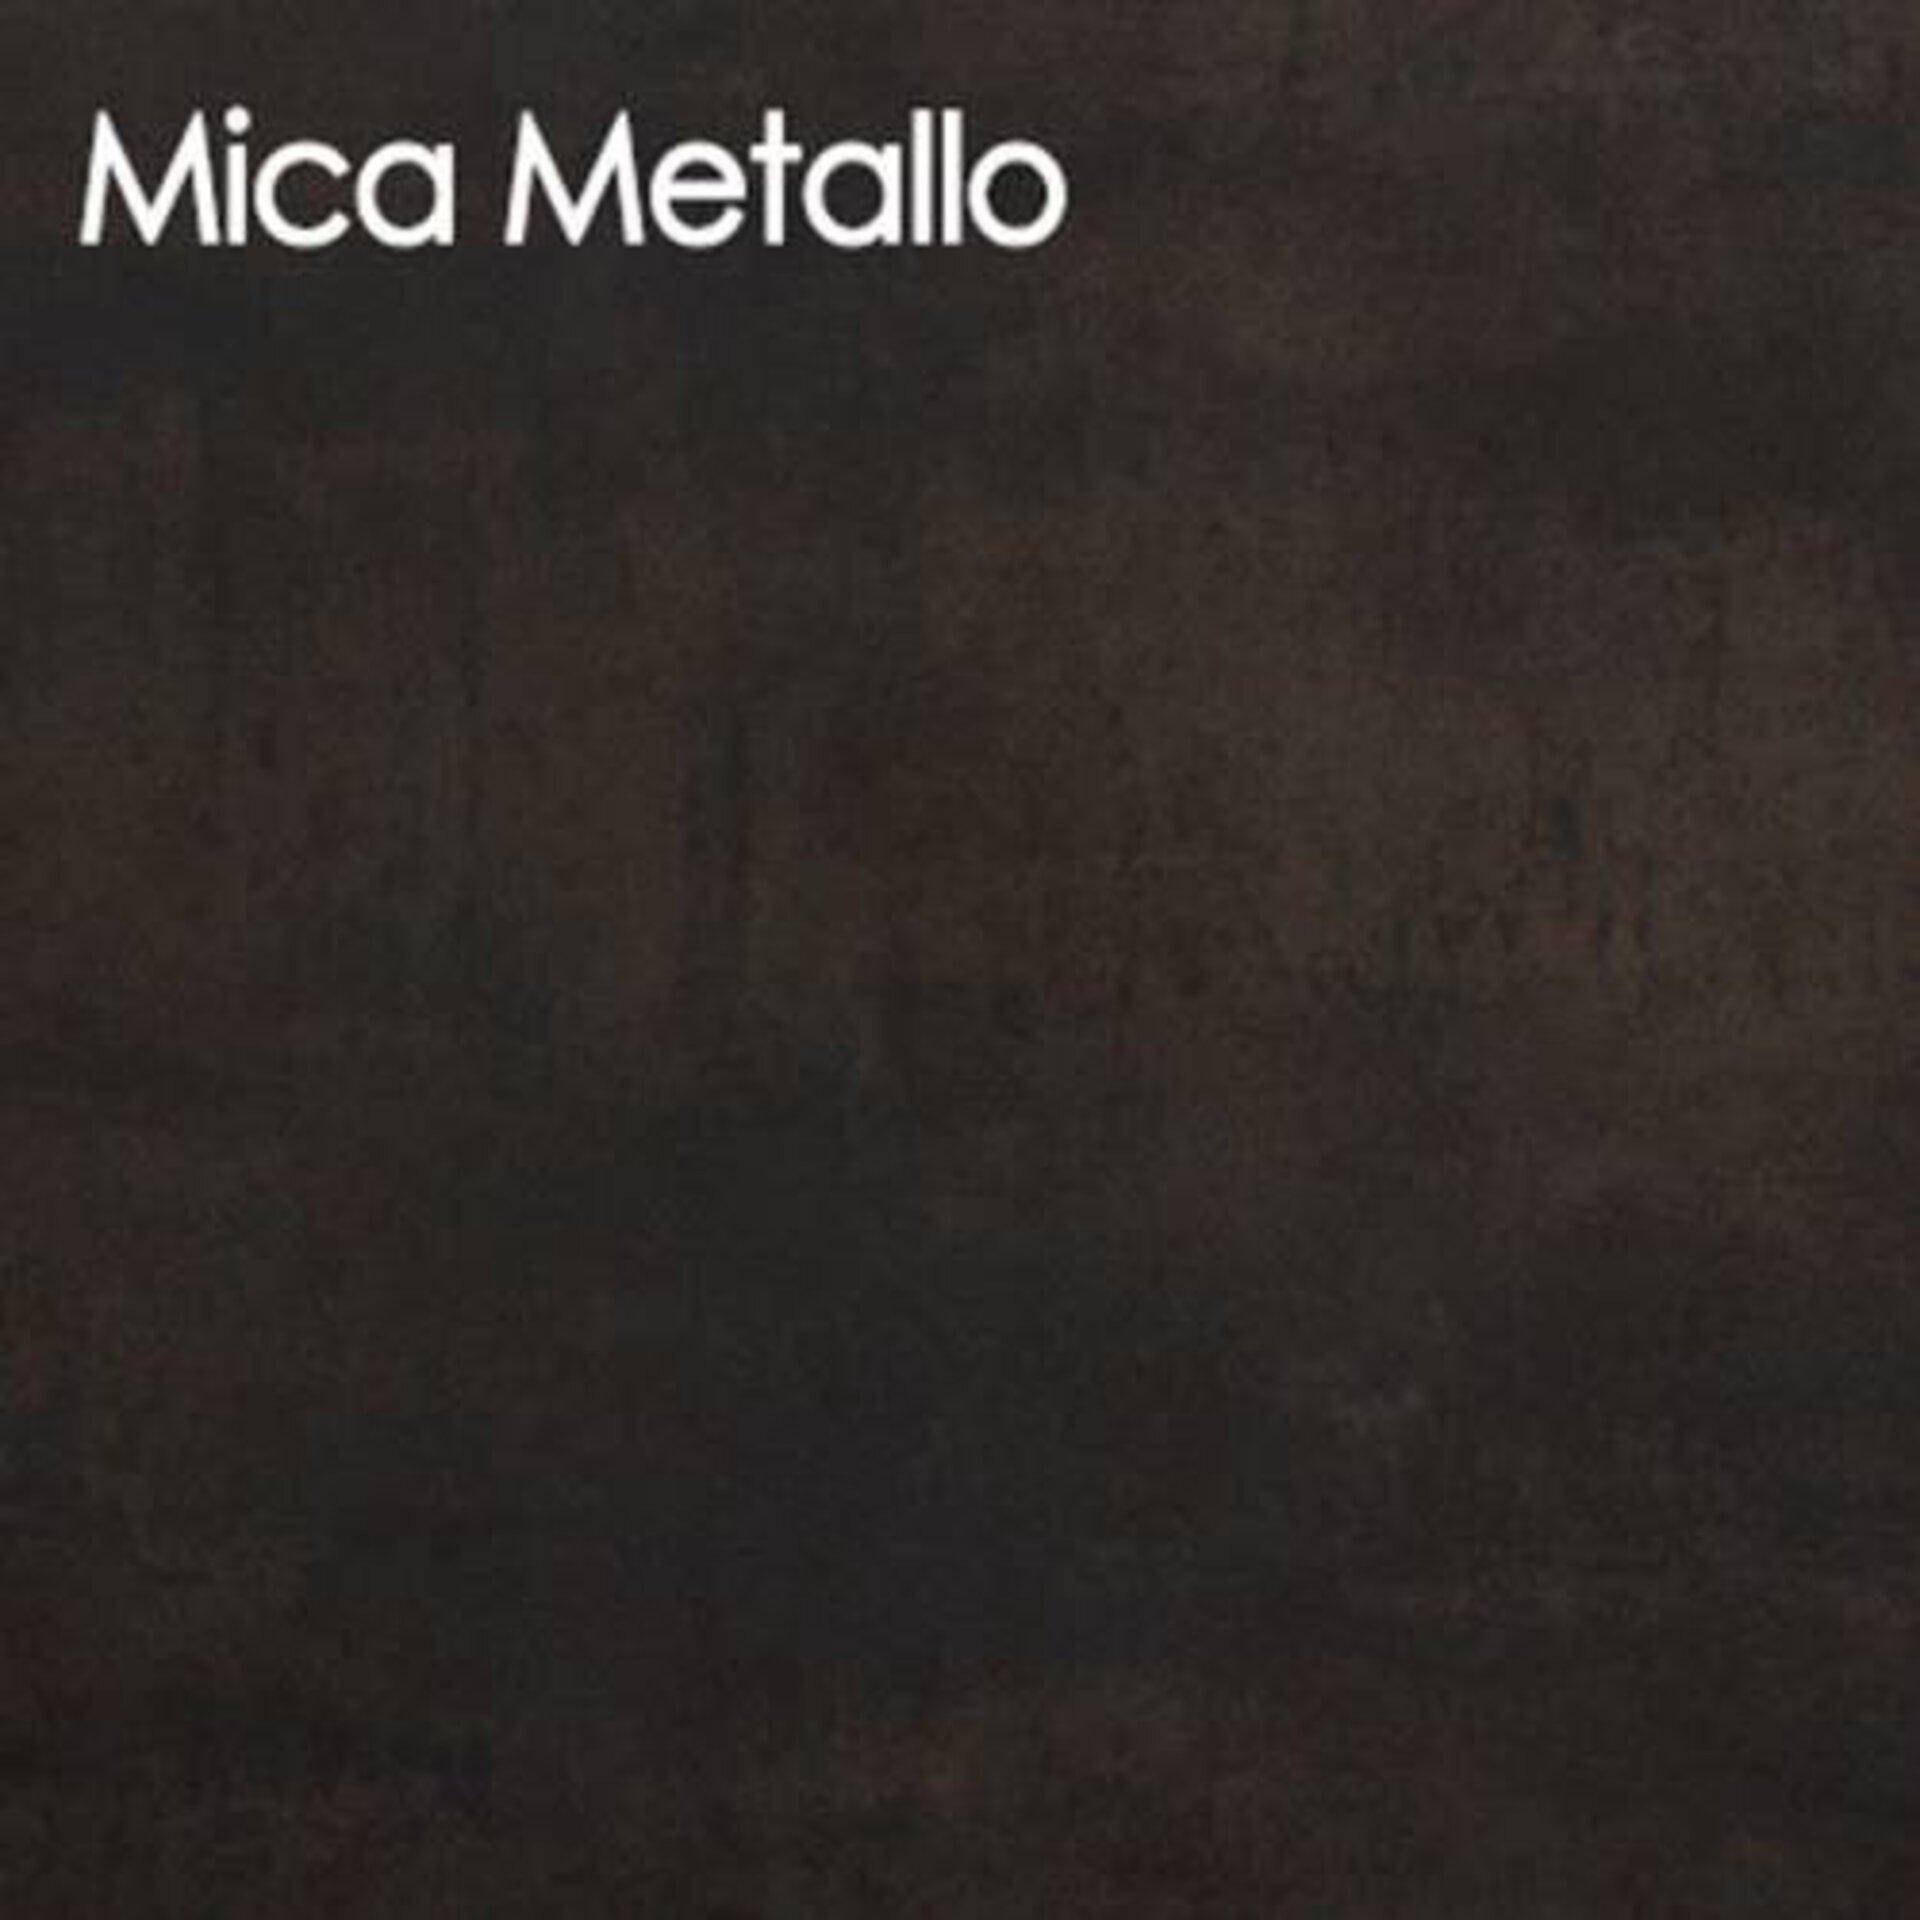 Arbeitsplatte aus Keramik in der Edelrostoptik Mica Metallo.